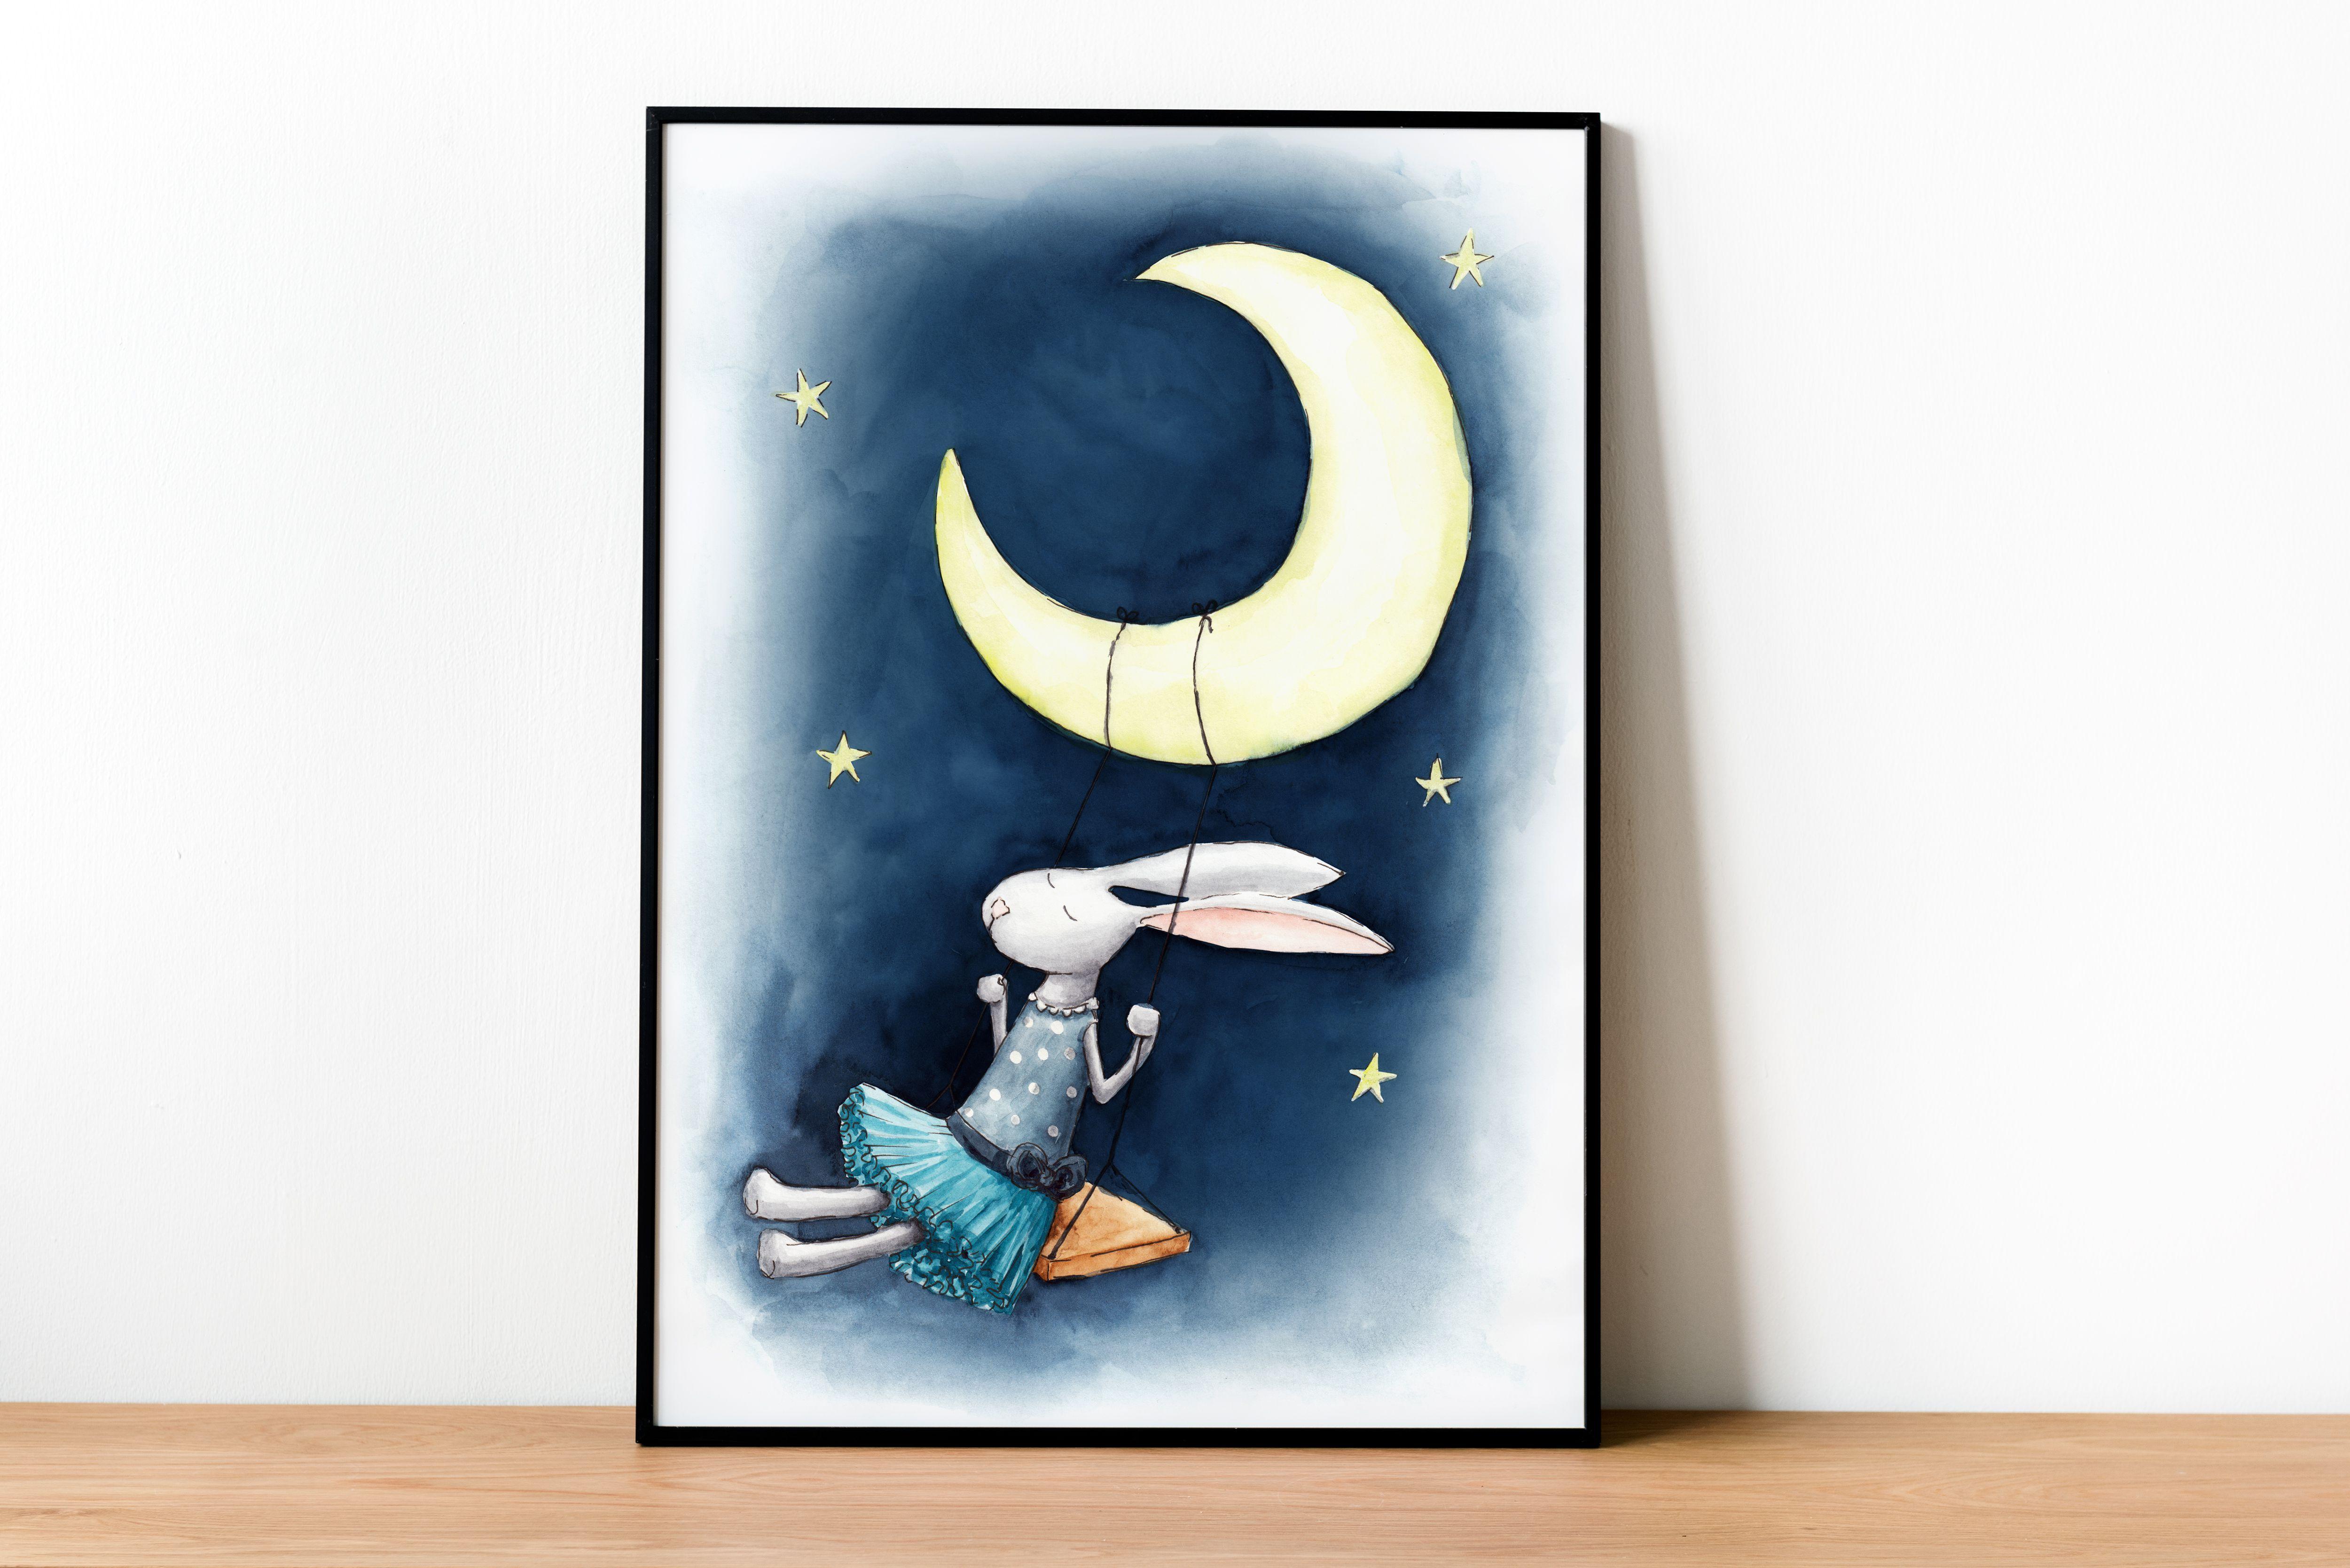 dcd817a301dc5 Girl room decor, Printable Nursery Wall Art, Swinging Bunny Nursery Print,  Instant Download Nursery Wall Art, Printable Toddler Room Art